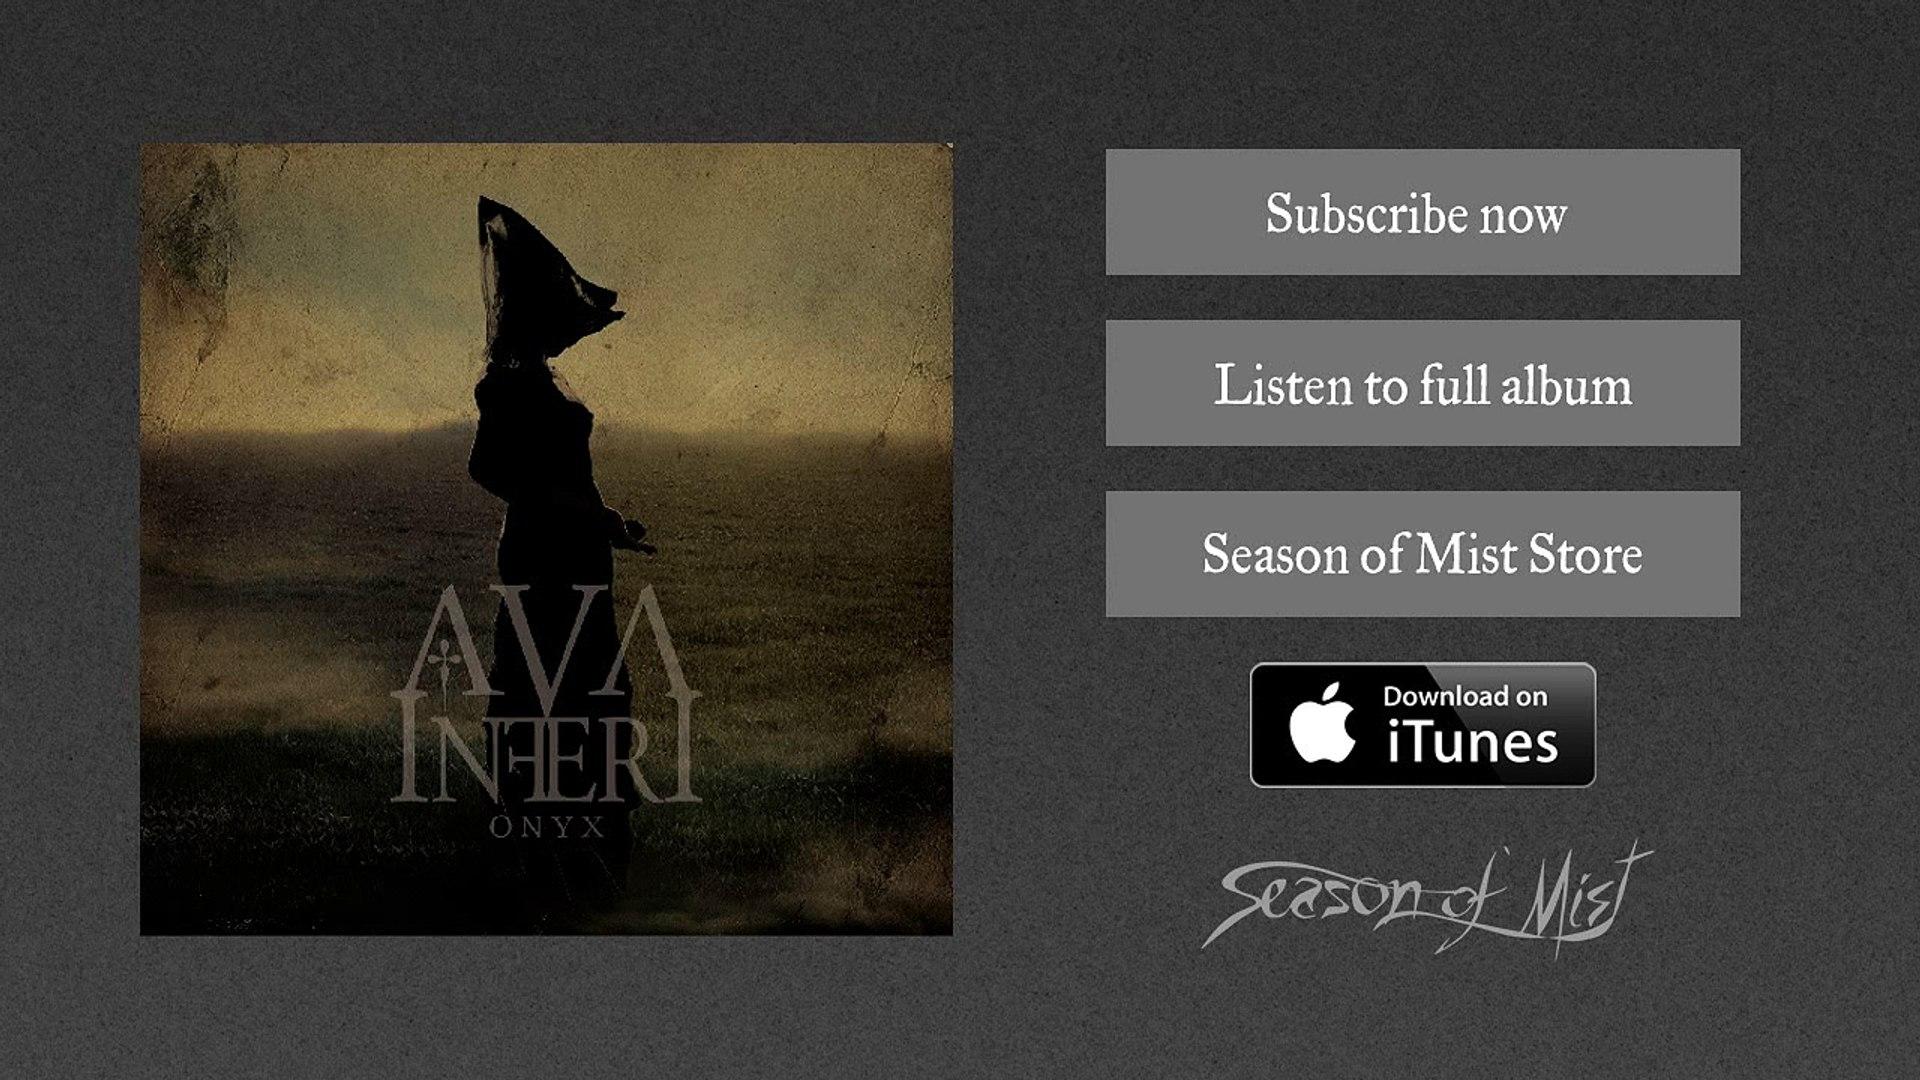 Ava Inferi - Majesty